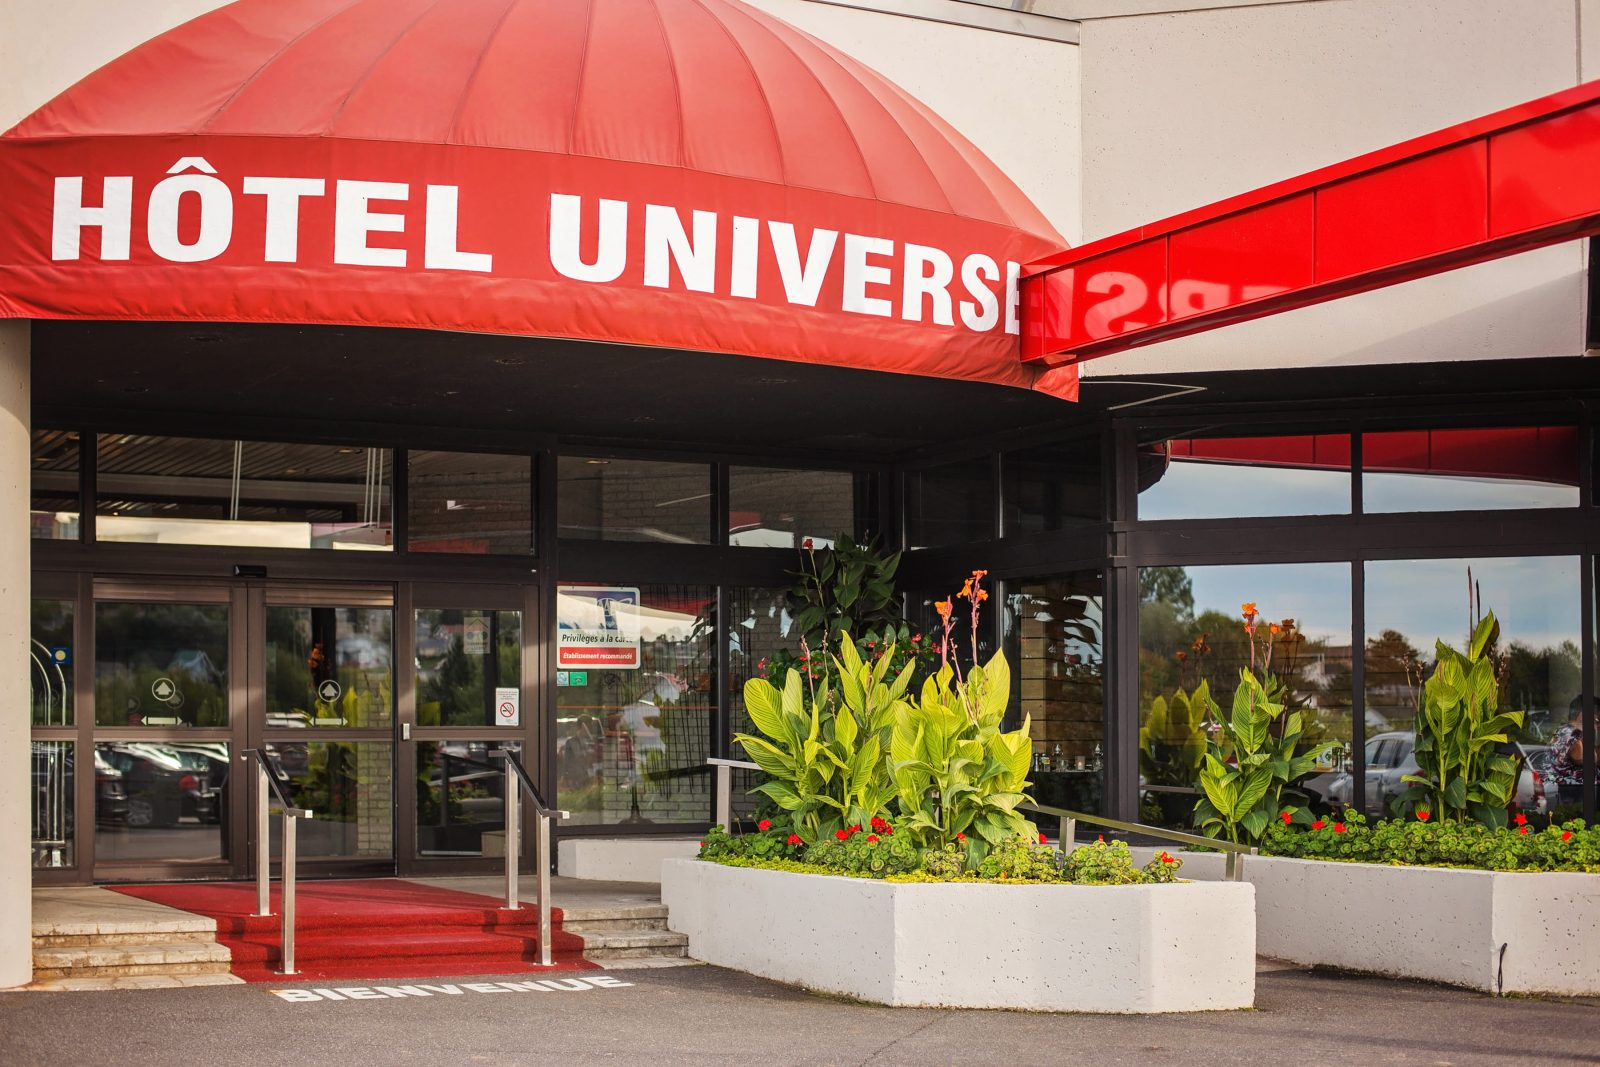 https://www.hoteluniversel.com/wp-content/uploads/2018/09/Hotel-Universel-extérieur-sept-2018-1600x1067.jpg